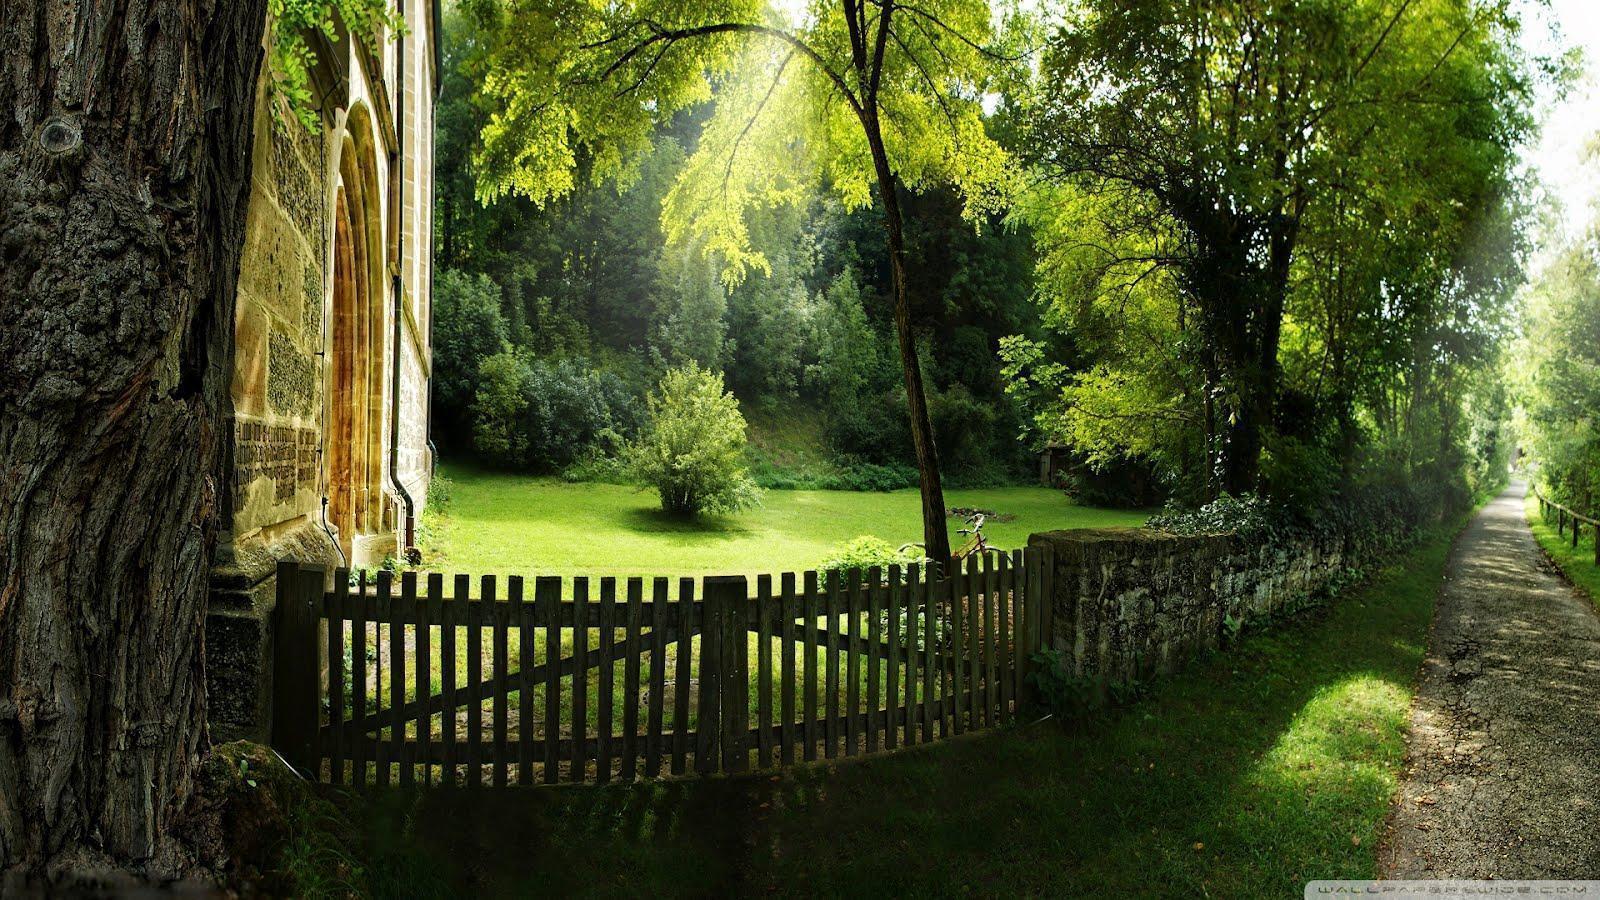 free summer wallpapers ndash - photo #35